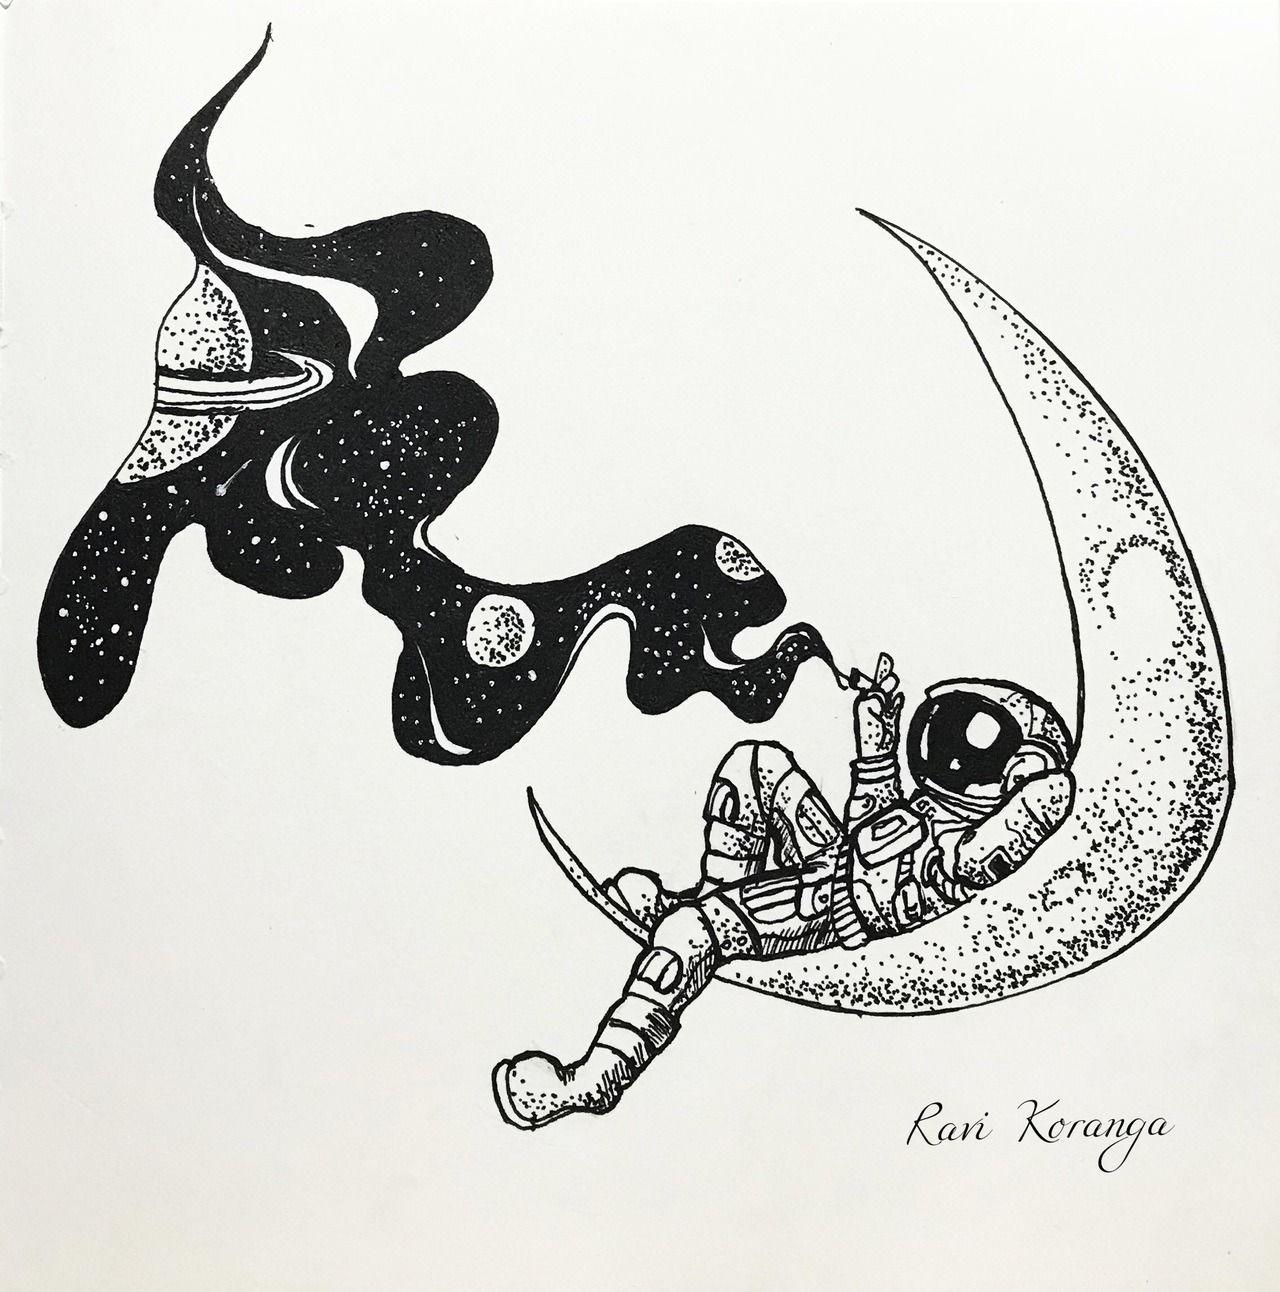 Ravi Koranga